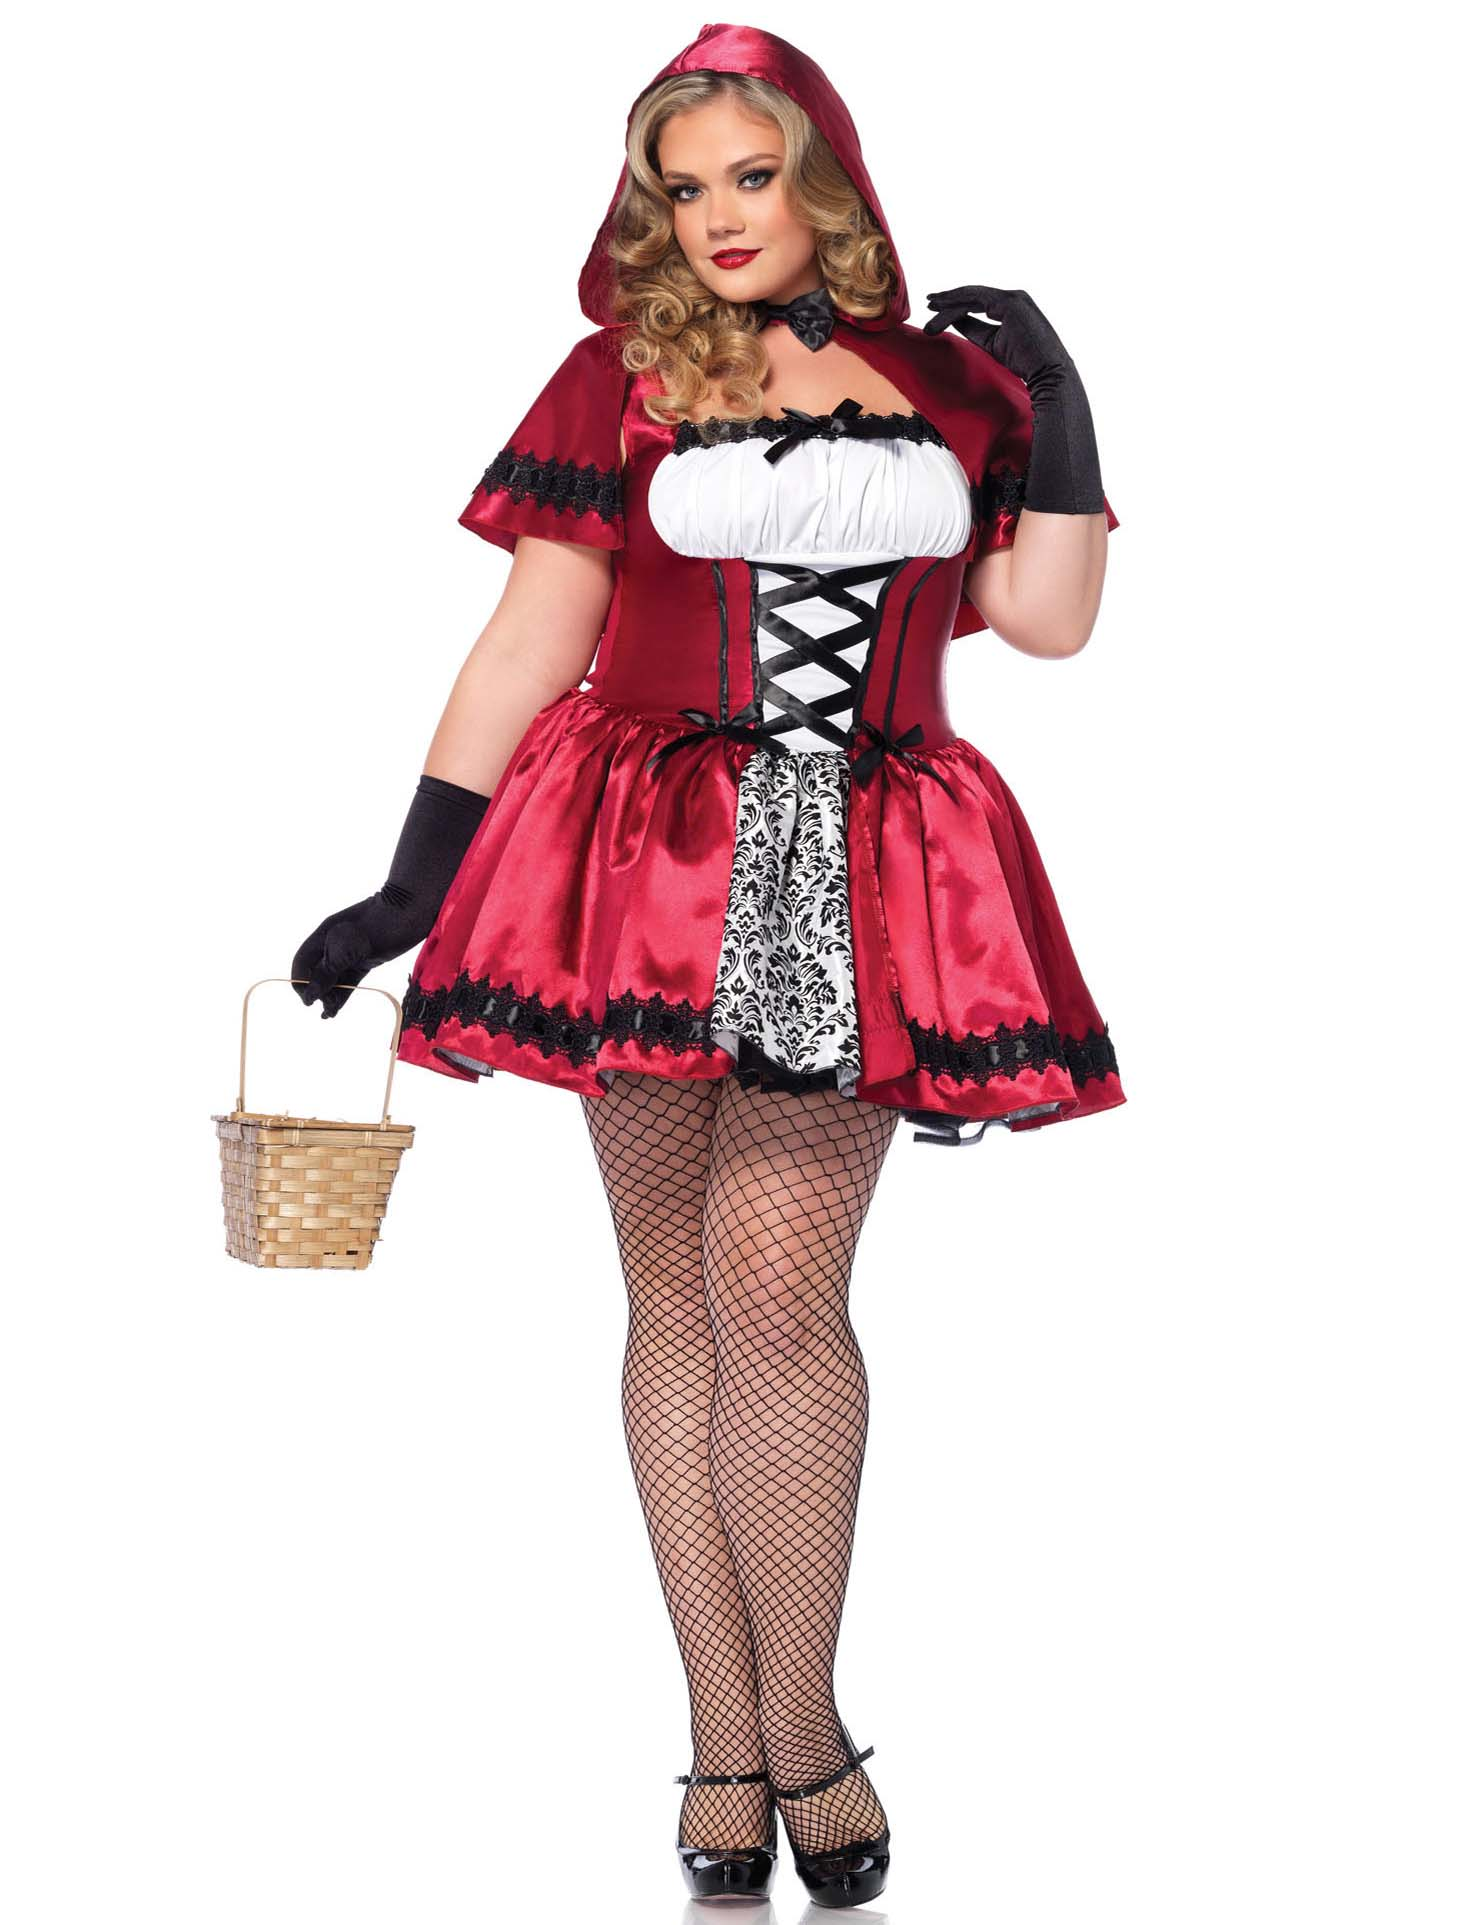 Carnavalskleding Grote Maten Dames.Grote Maat Roodkapje Carnavalskleding Voor Dames Vegaoo Nl